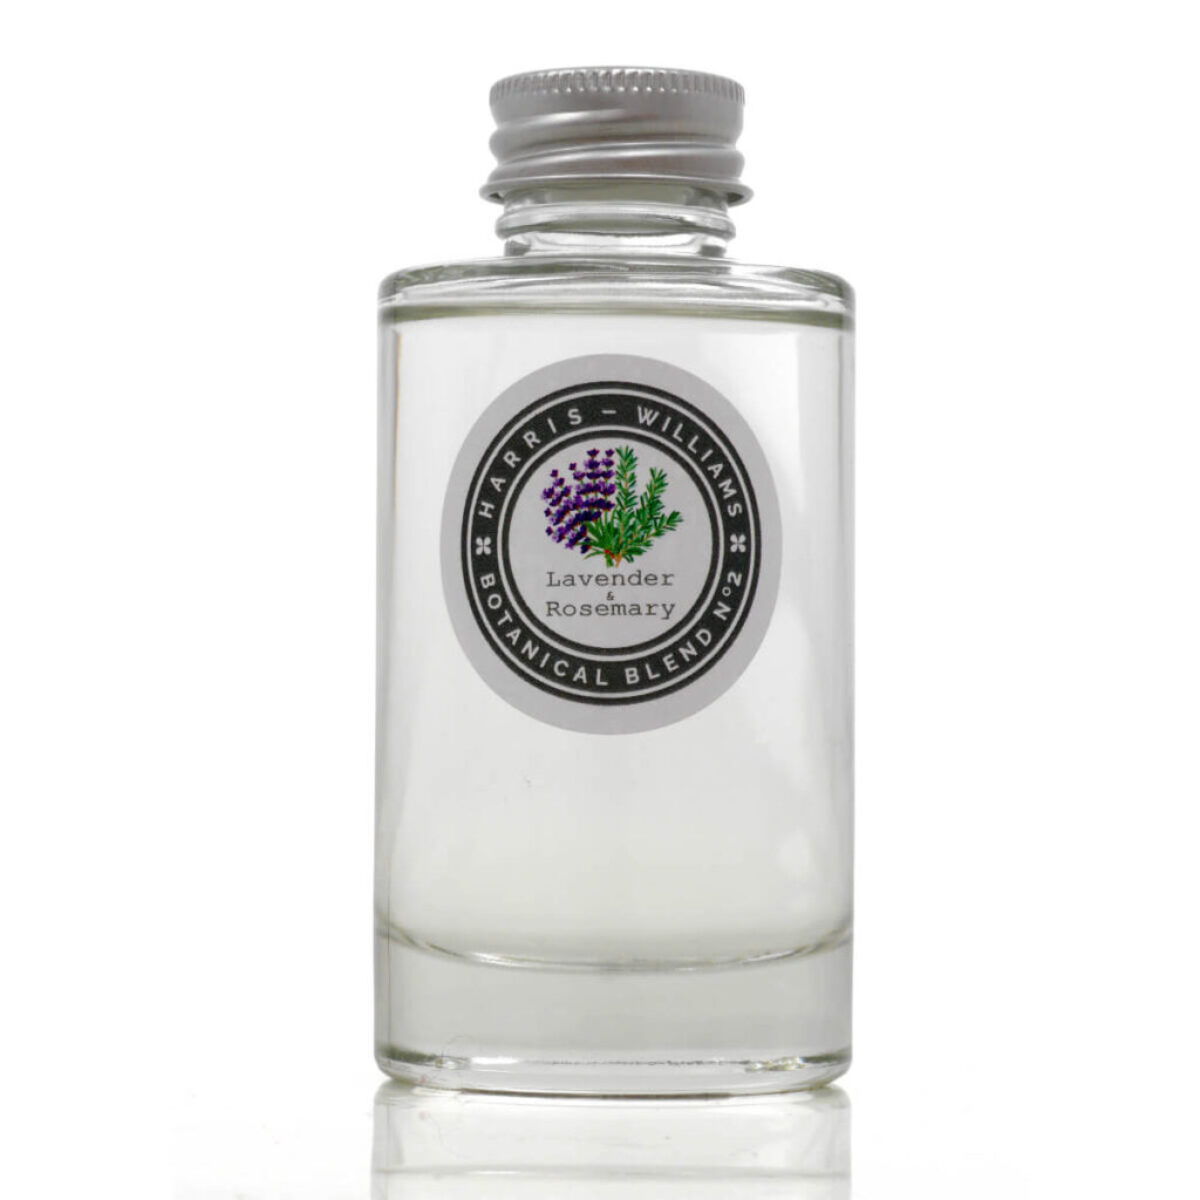 Botanical Blend No 2 Lavender & Rosemary Diffuser Refill